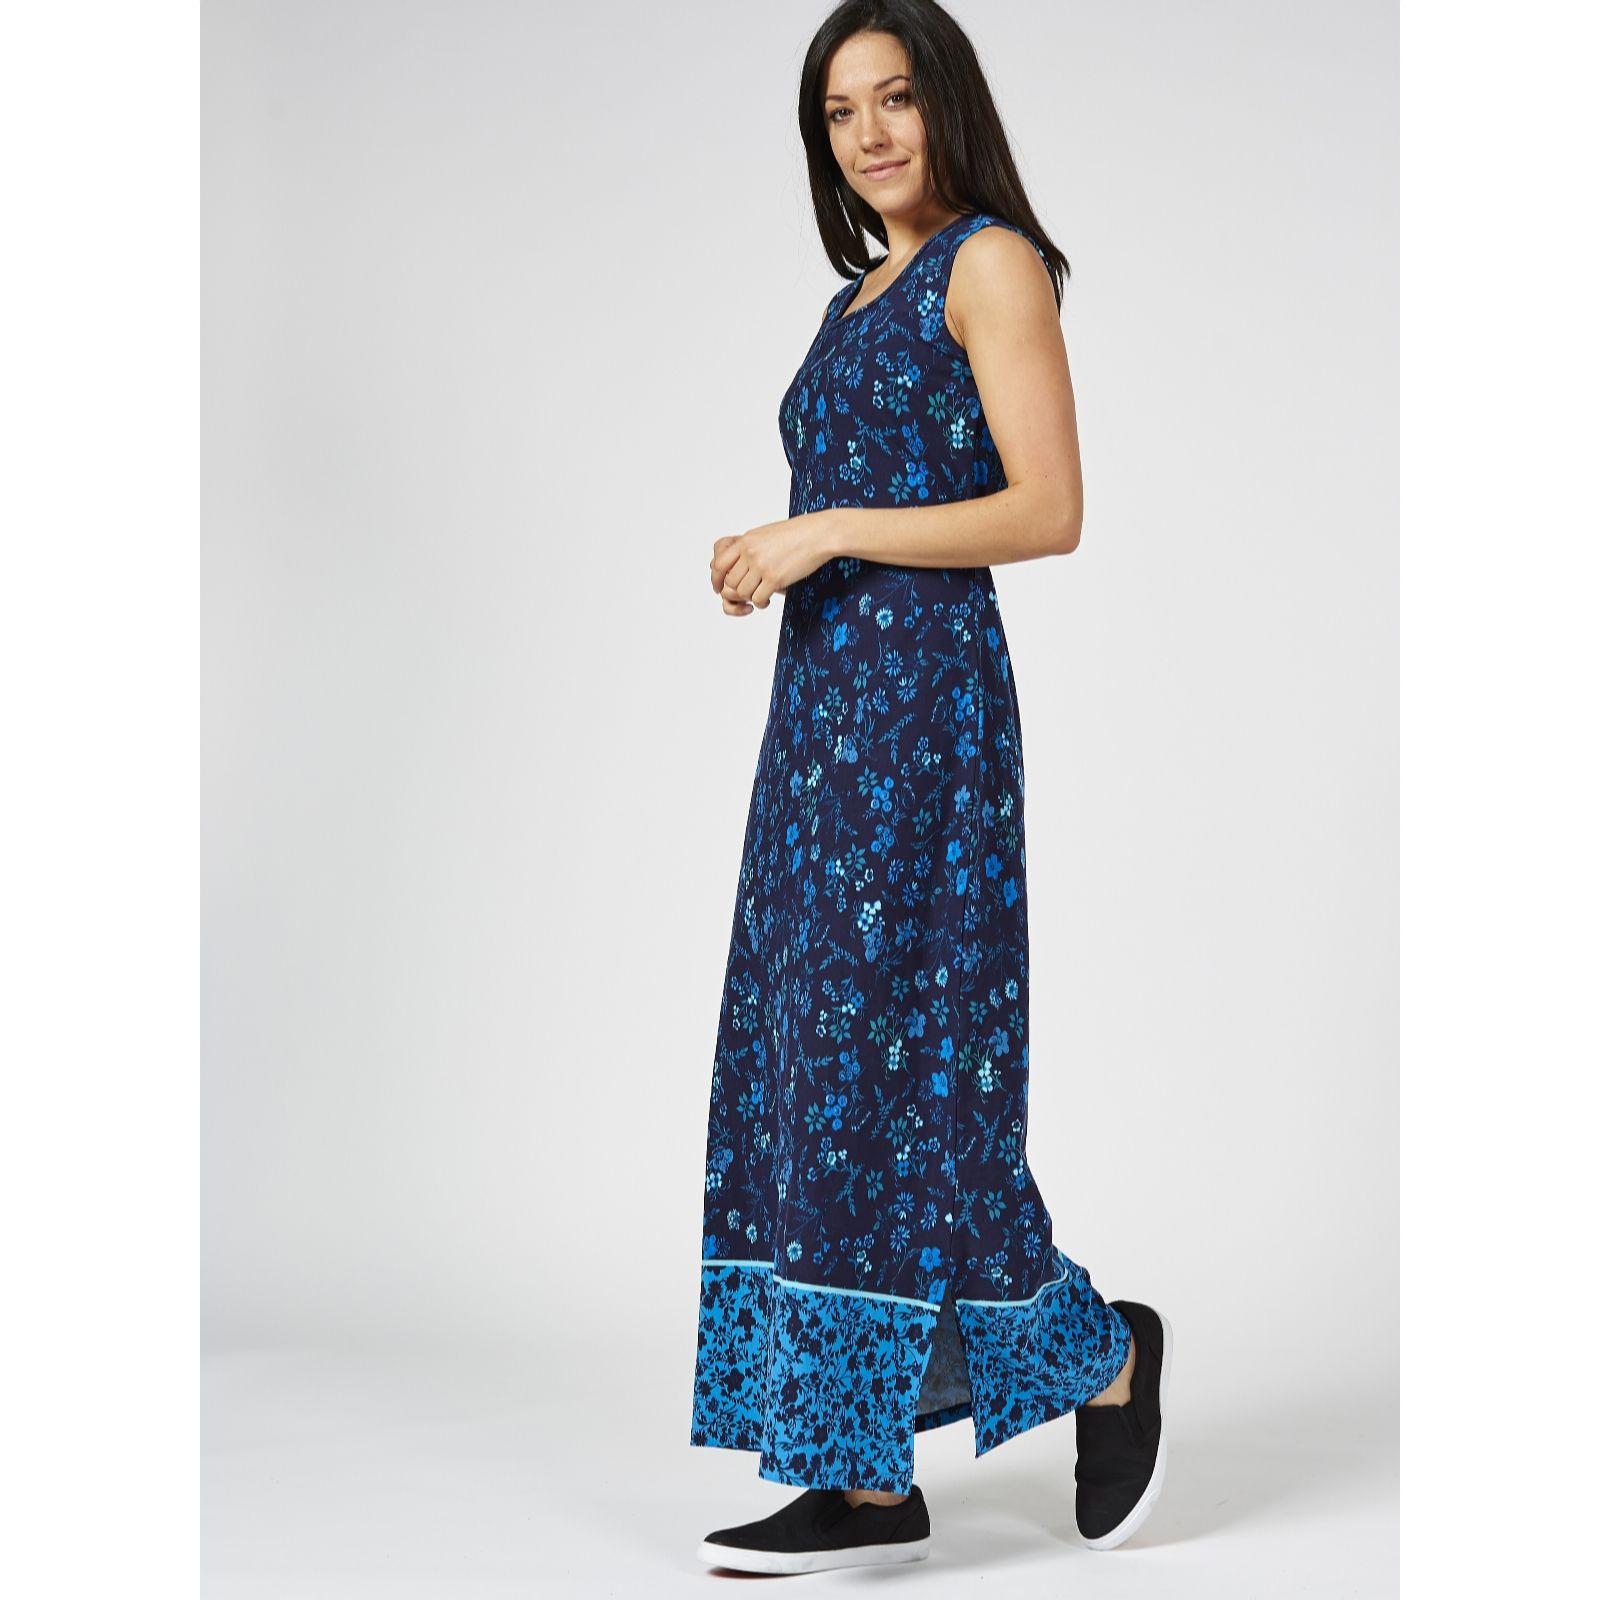 9b1f12a70b Denim   Co. Border Print Sleeveless Scoop Neck Maxi Dress - QVC UK